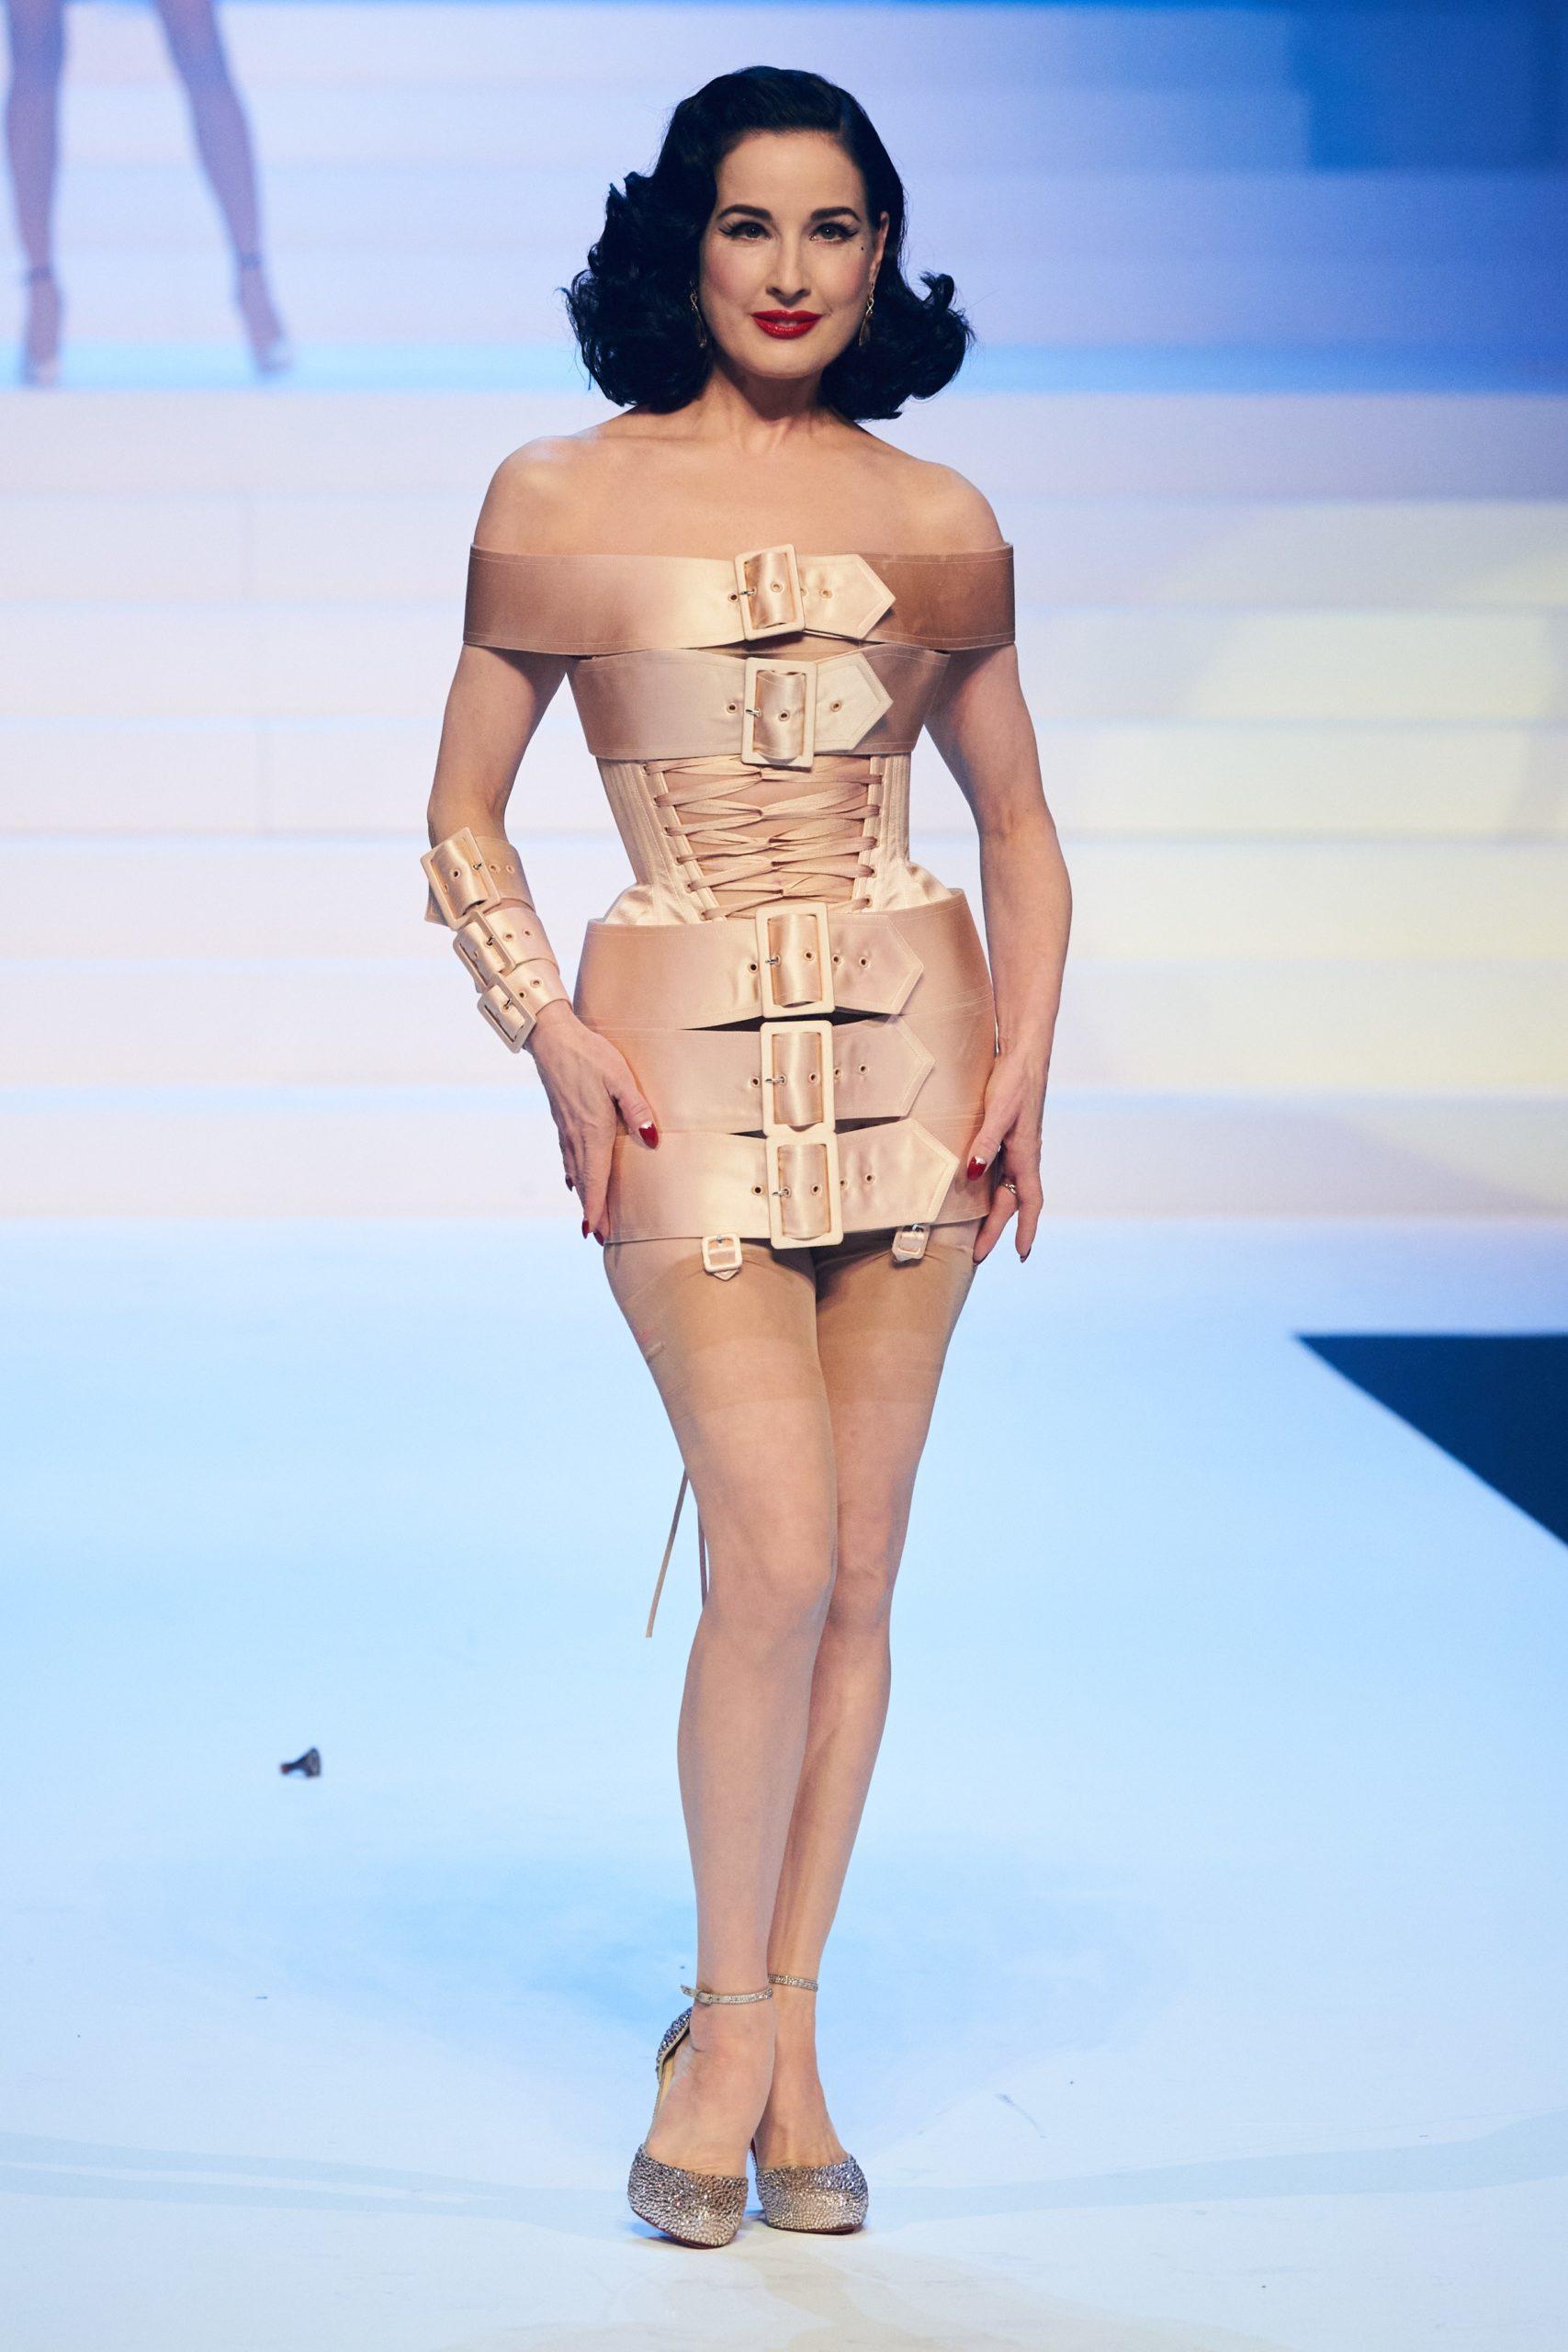 Dita Von Teese at Jean-Paul Gaultier SS20 Haute Couture (Photo credit: Jean-Paul Gaultier)